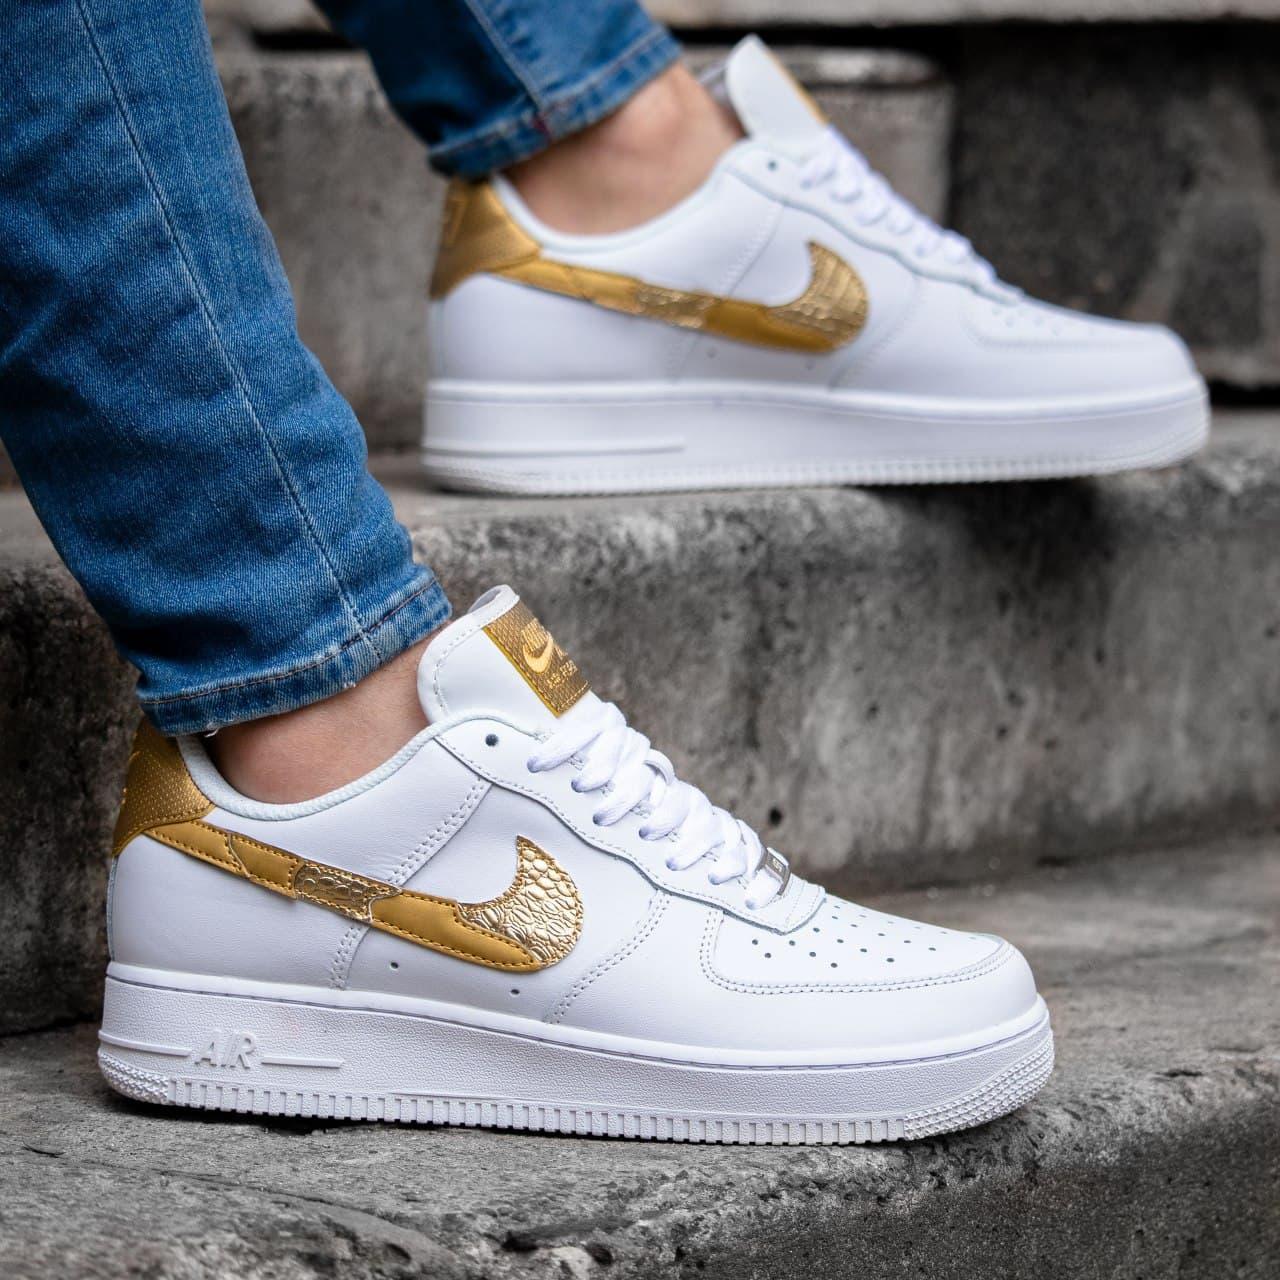 Мужские кроссовки Nike Air Force 1 Golden